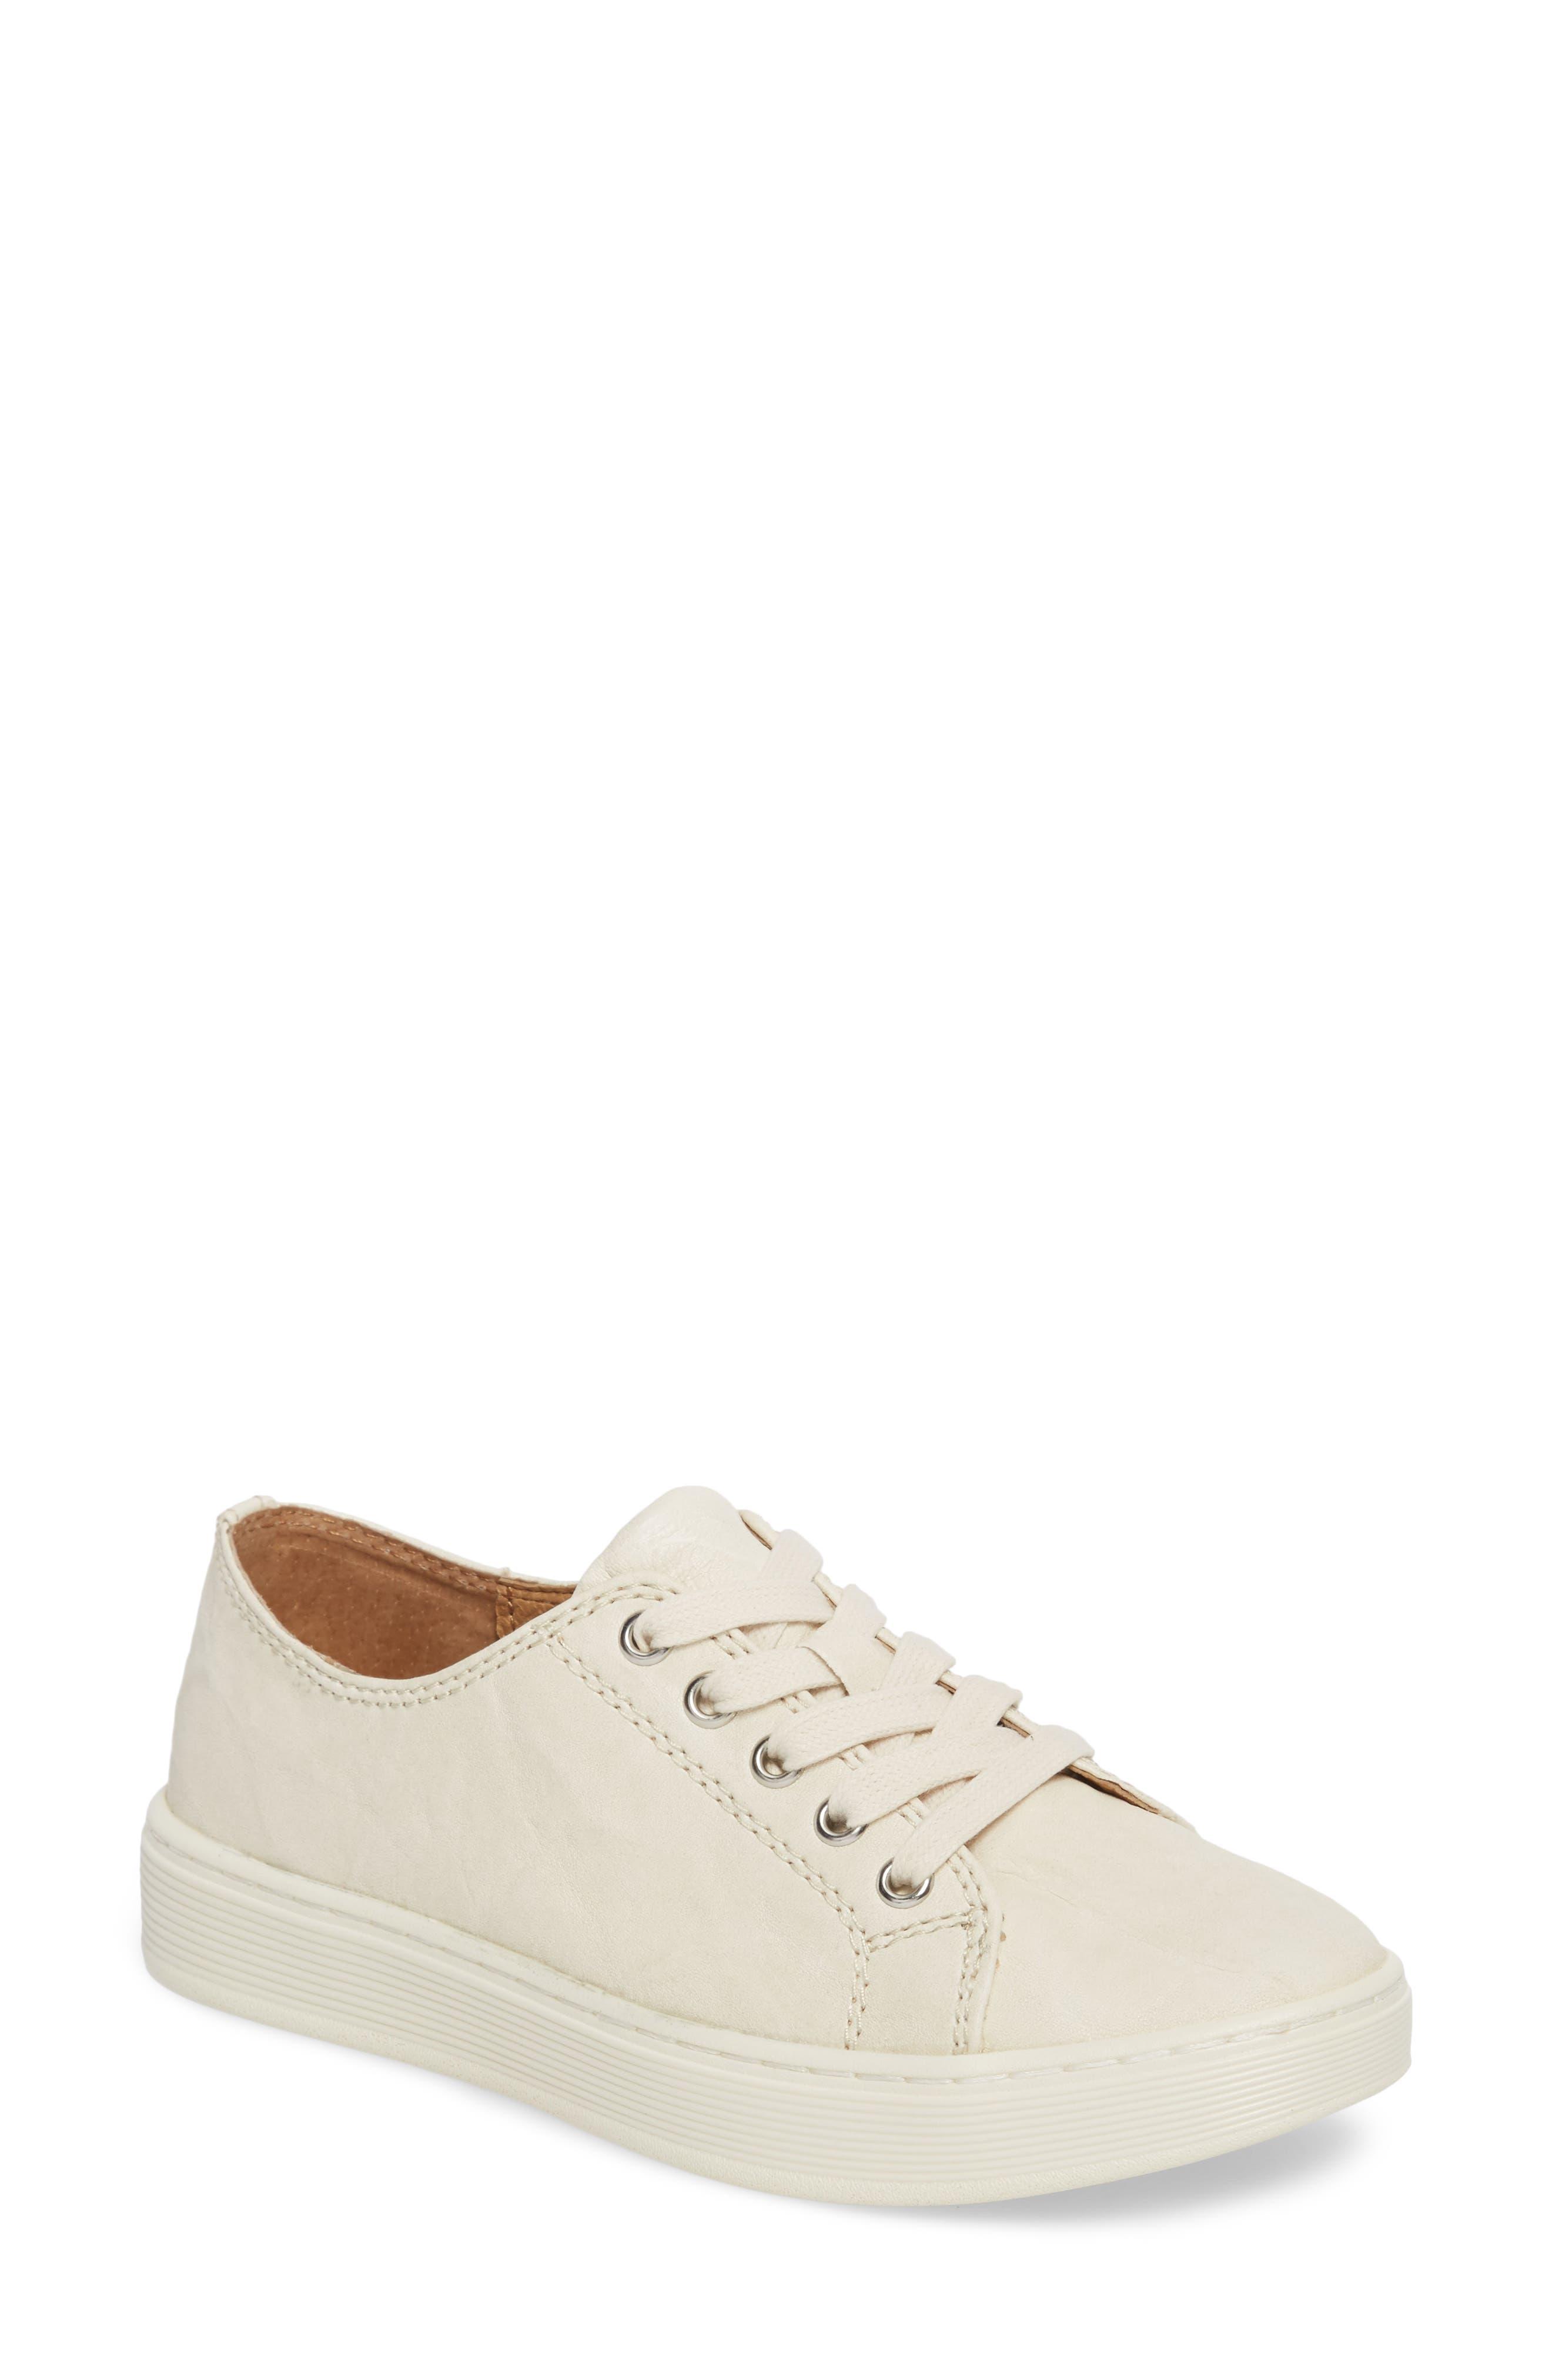 Baltazar Sneaker,                         Main,                         color, Latte Leather